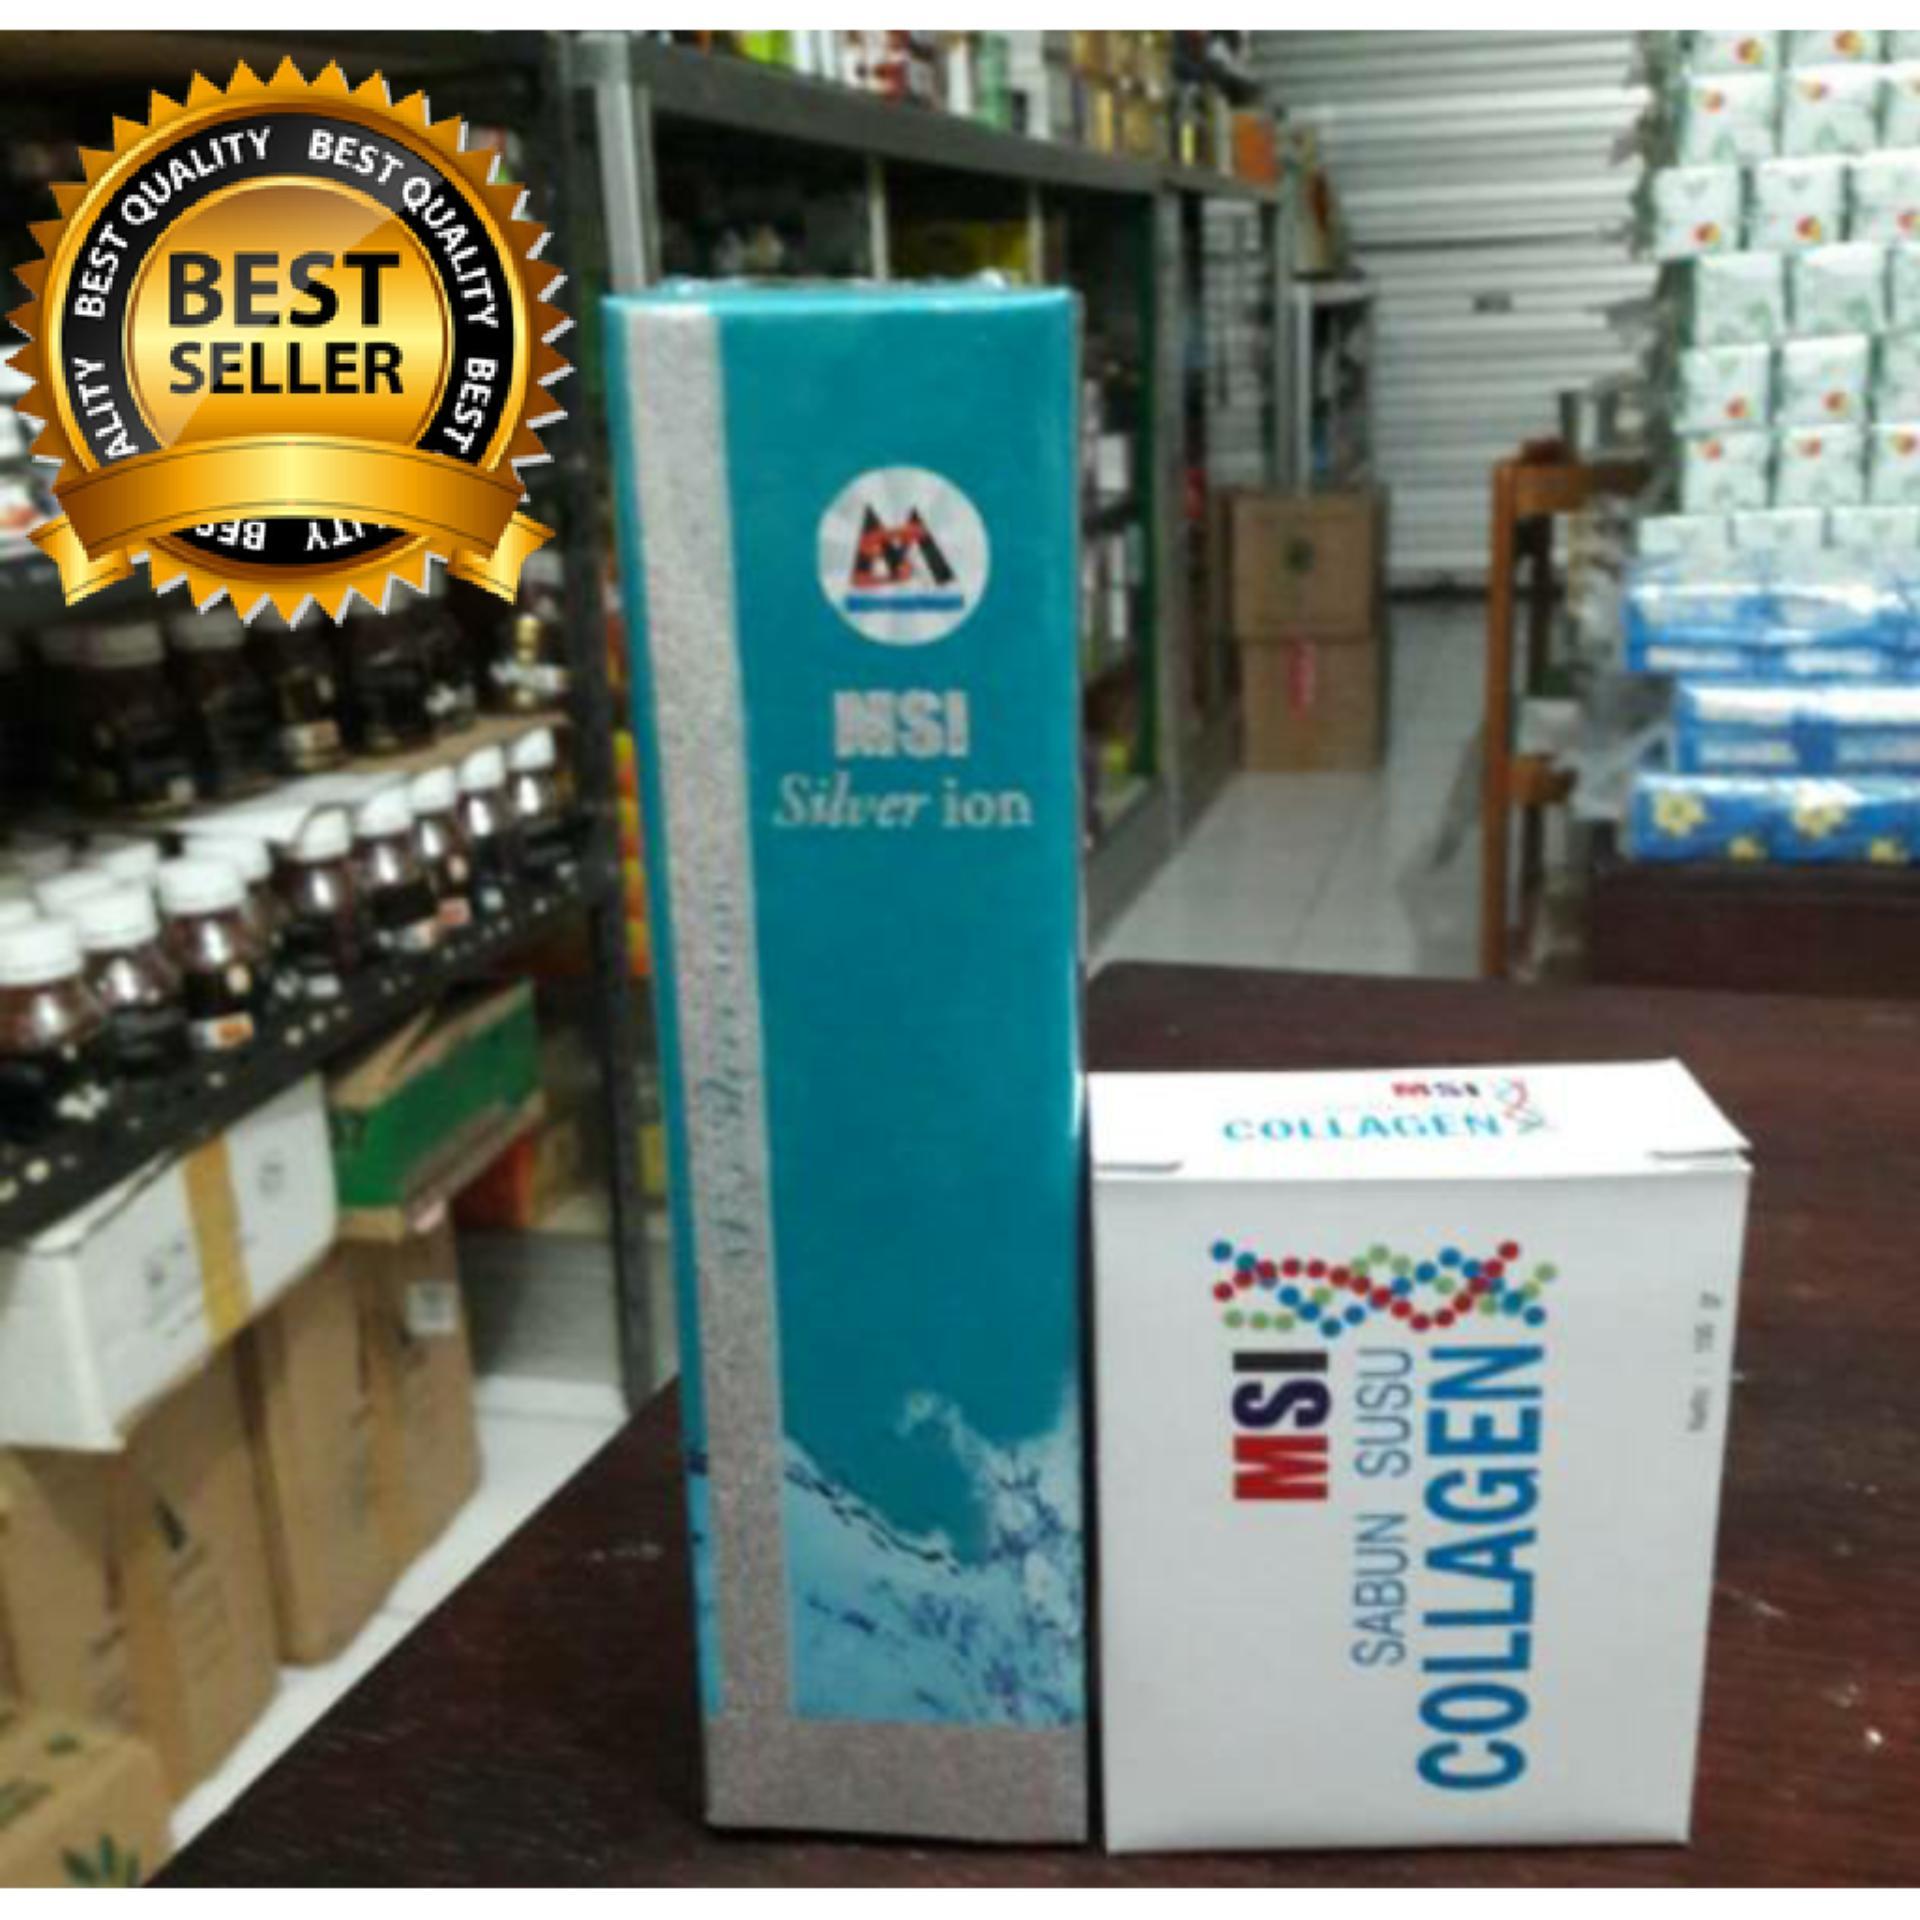 Belanja Terbaik Msi Paket Silver Ion Spray Sabun Collagen Perak Original Member